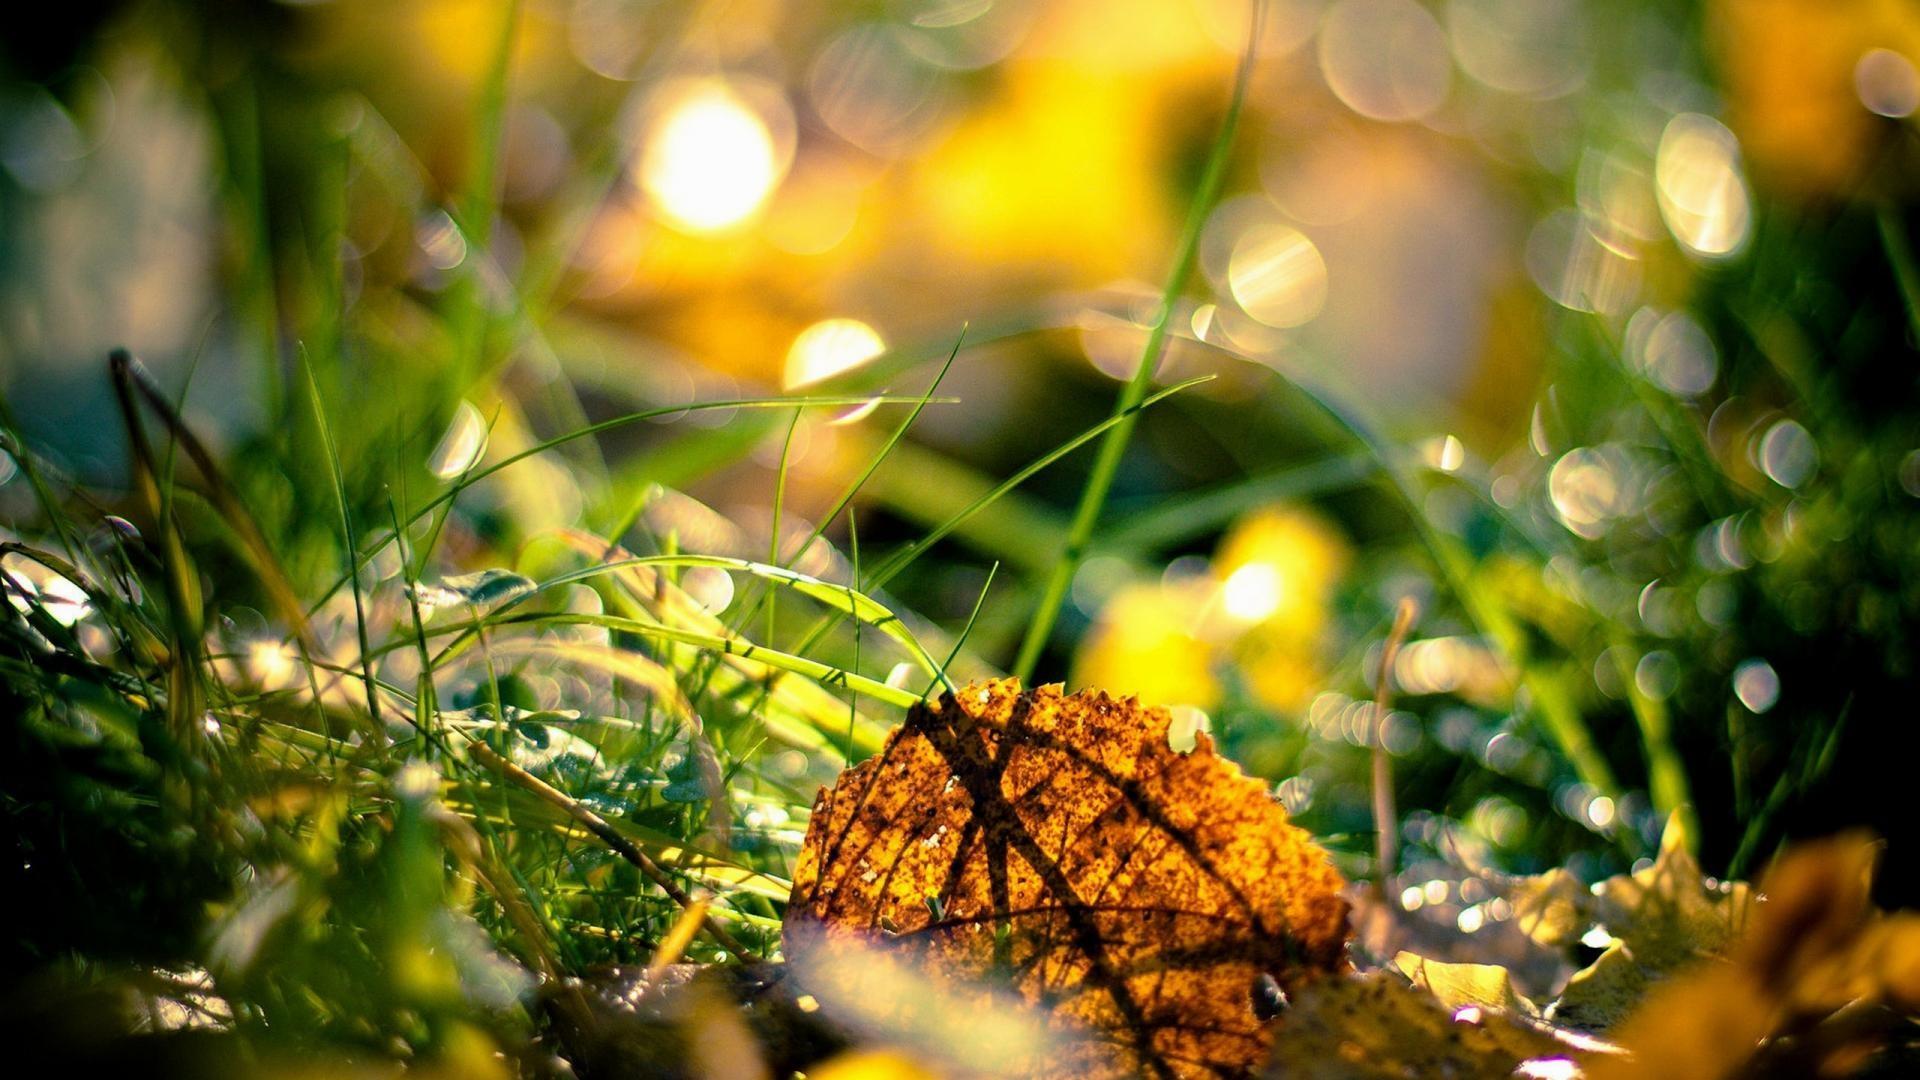 wallpaper.wiki-Autumn-fresh-season-1080p-hd-pictures-